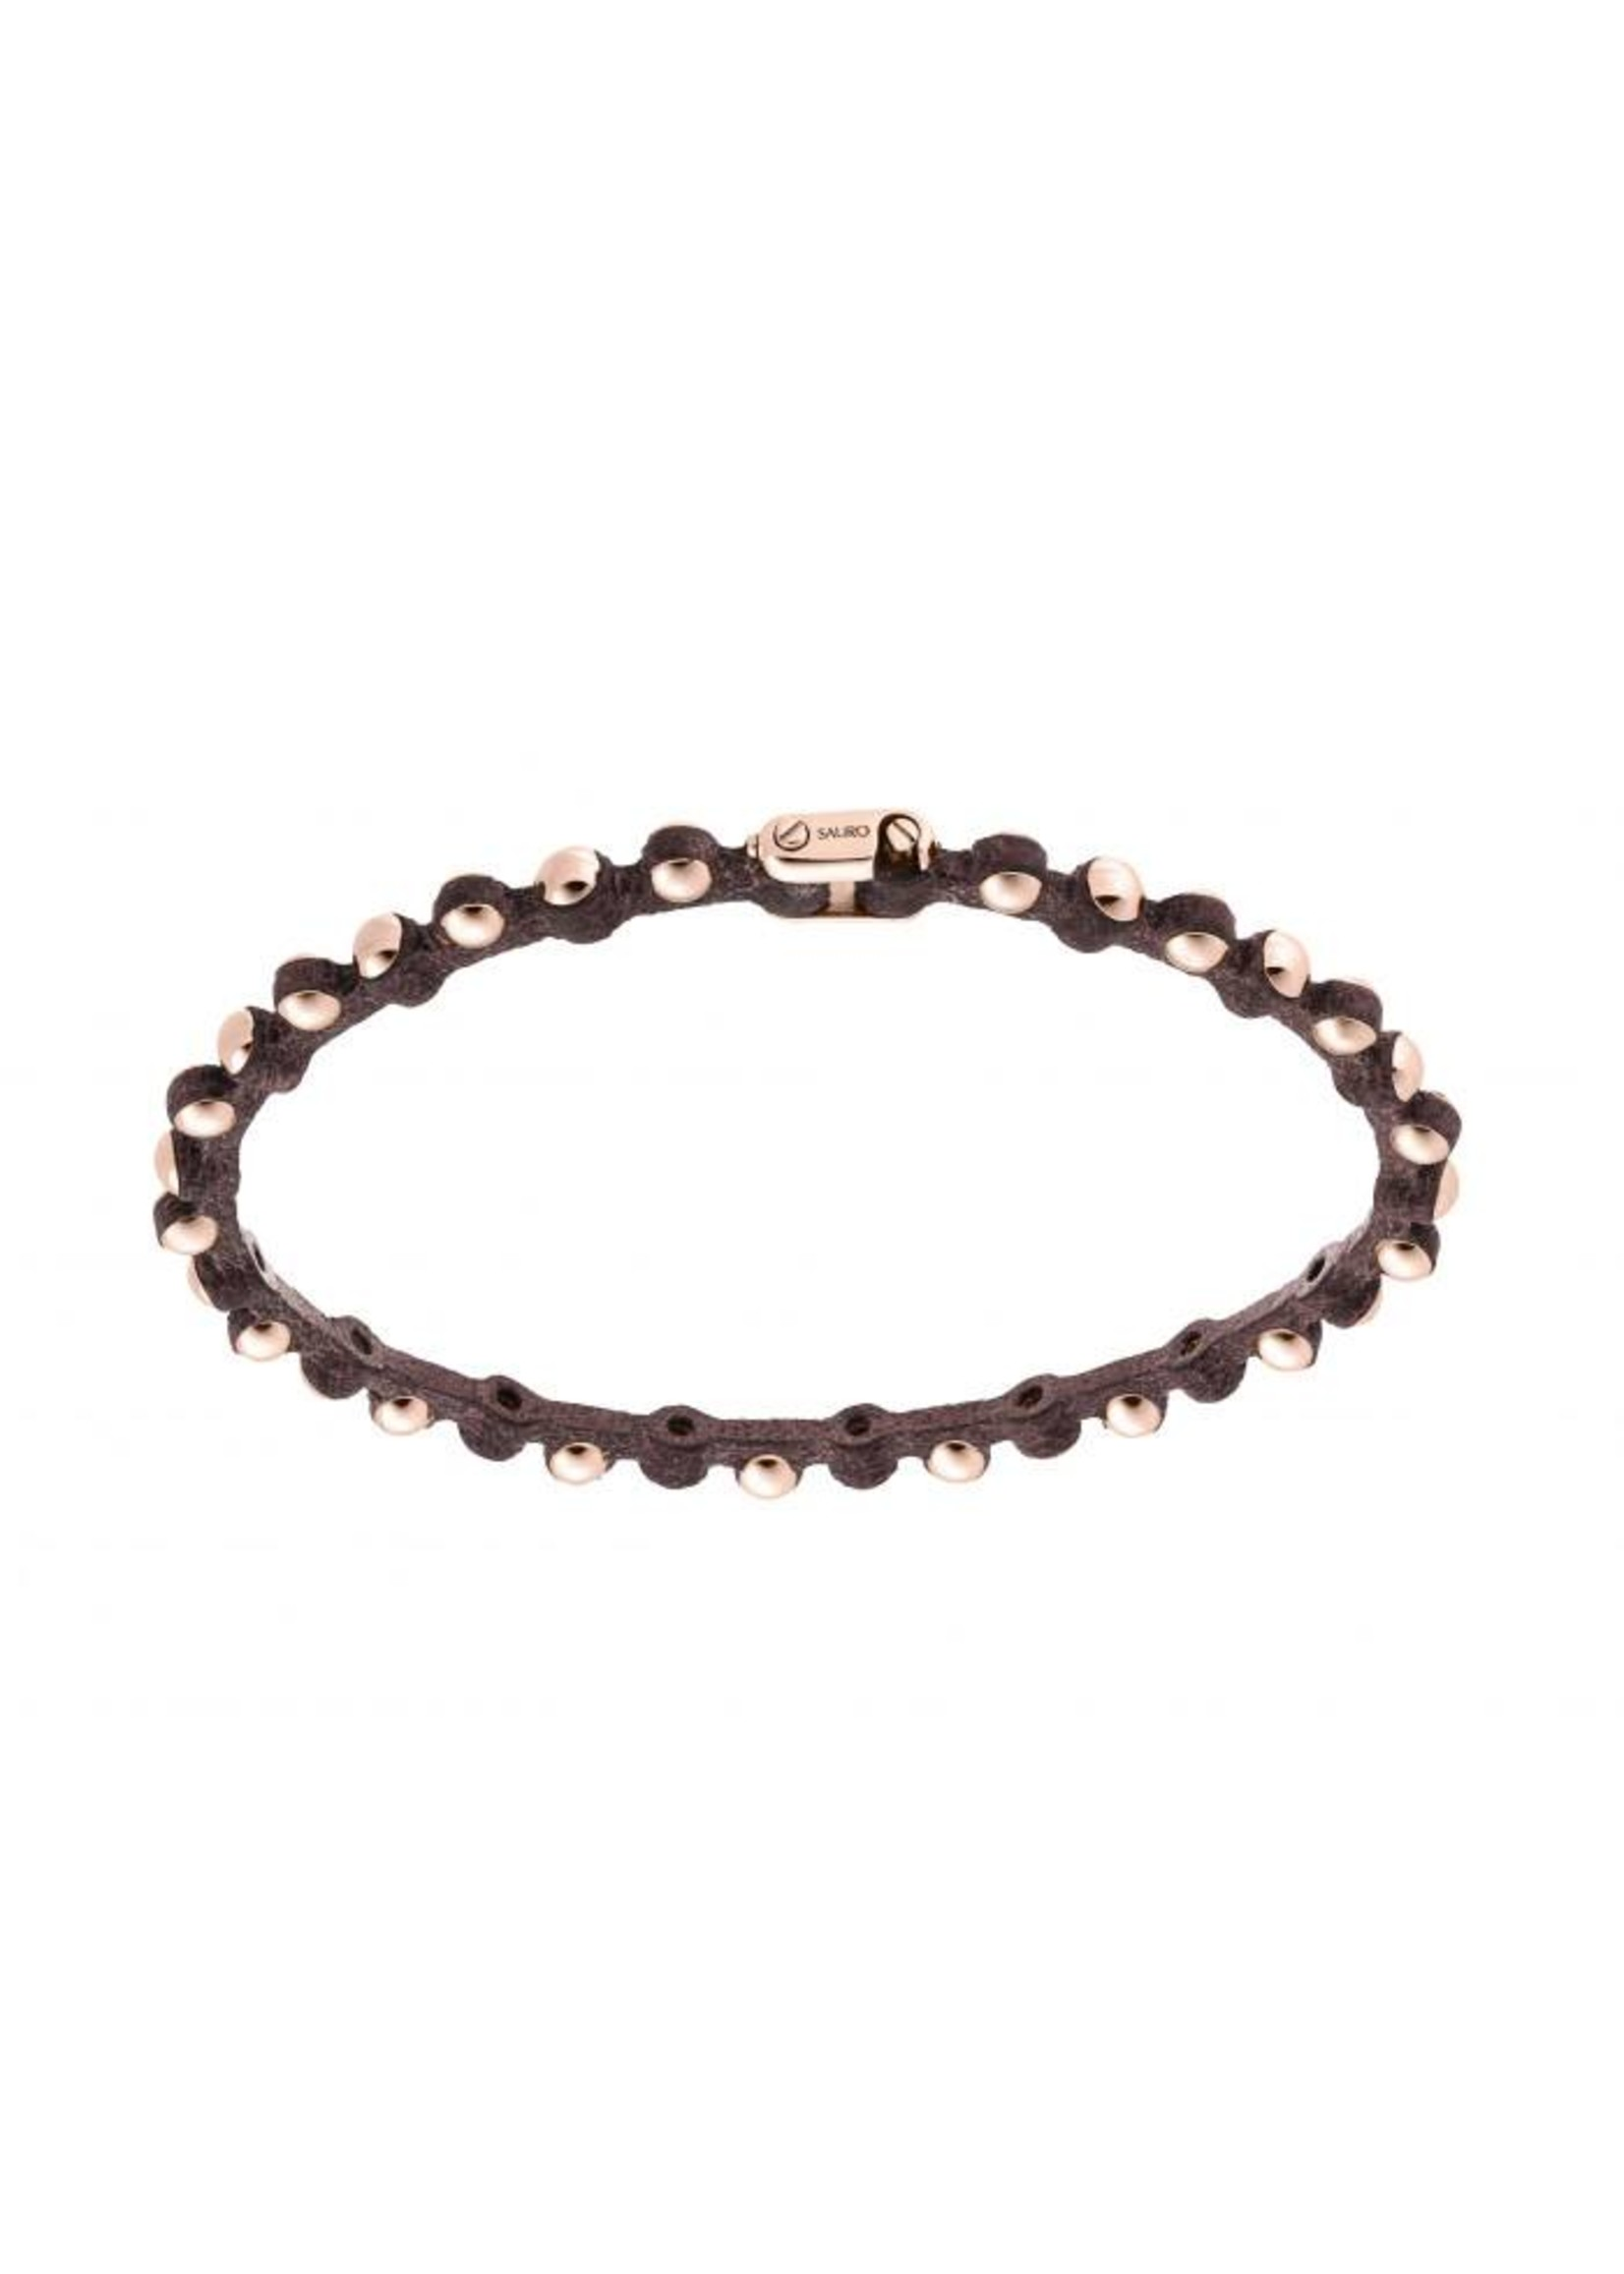 SAURO SAURO Thin Leather Bracelet #365